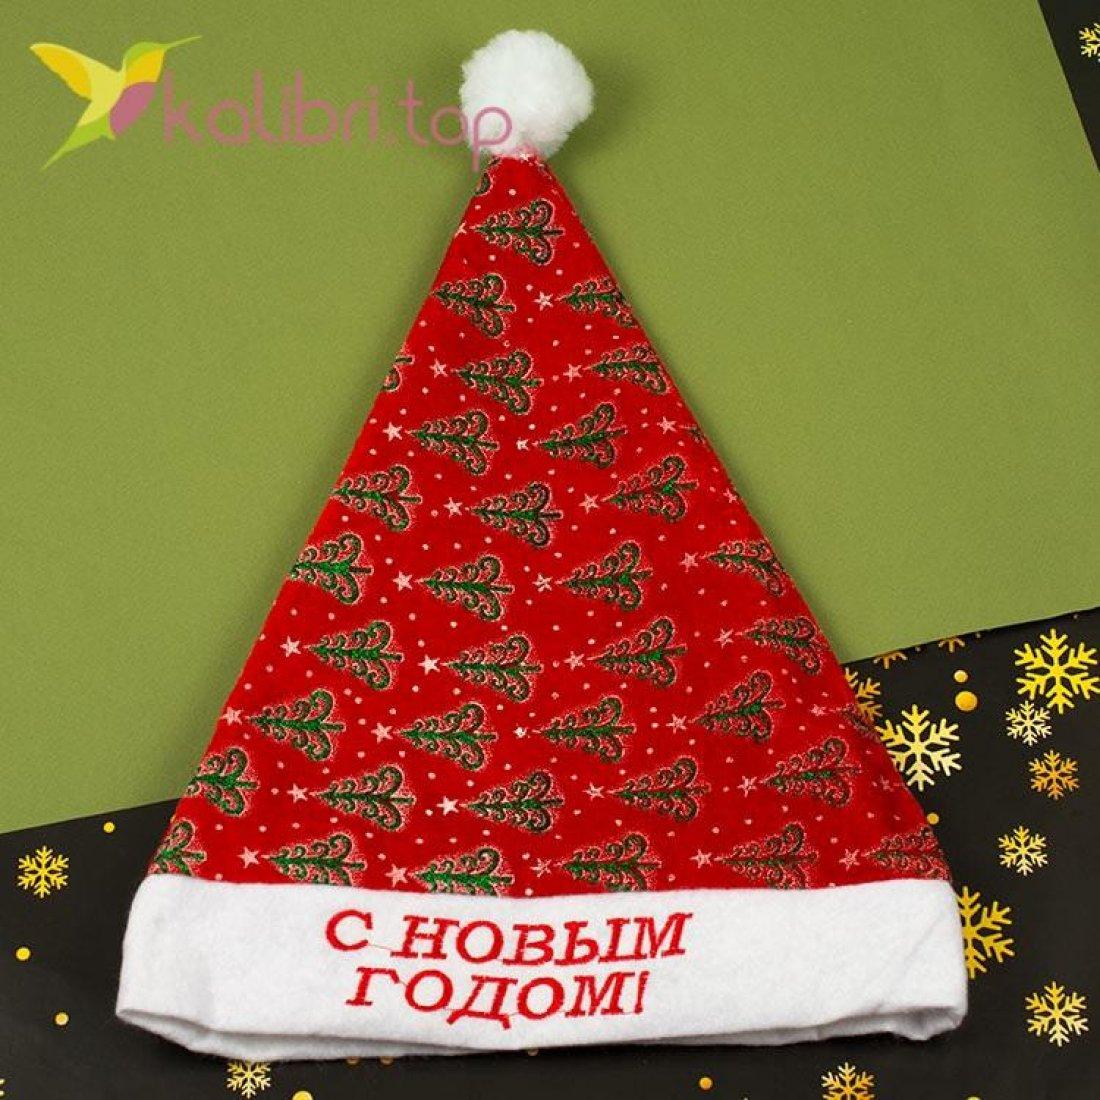 Новогодняя шапка Деда Мороза ёлочки, оптом фото 1